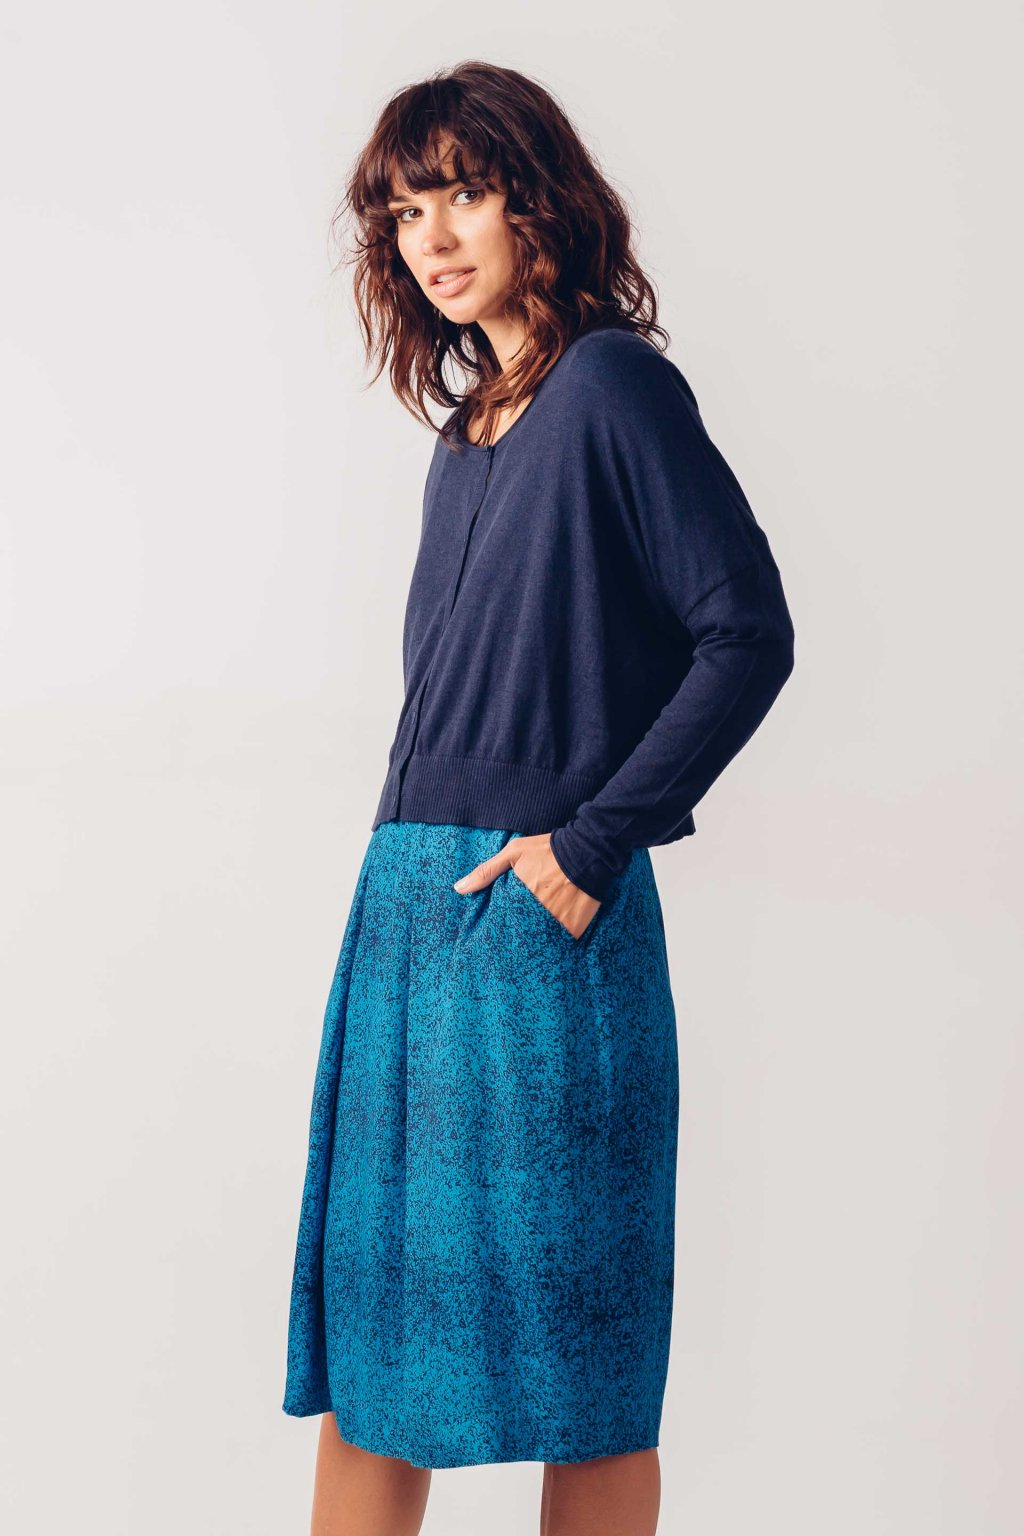 sweater lyocell ainho skfk wsw00399 bx ofb